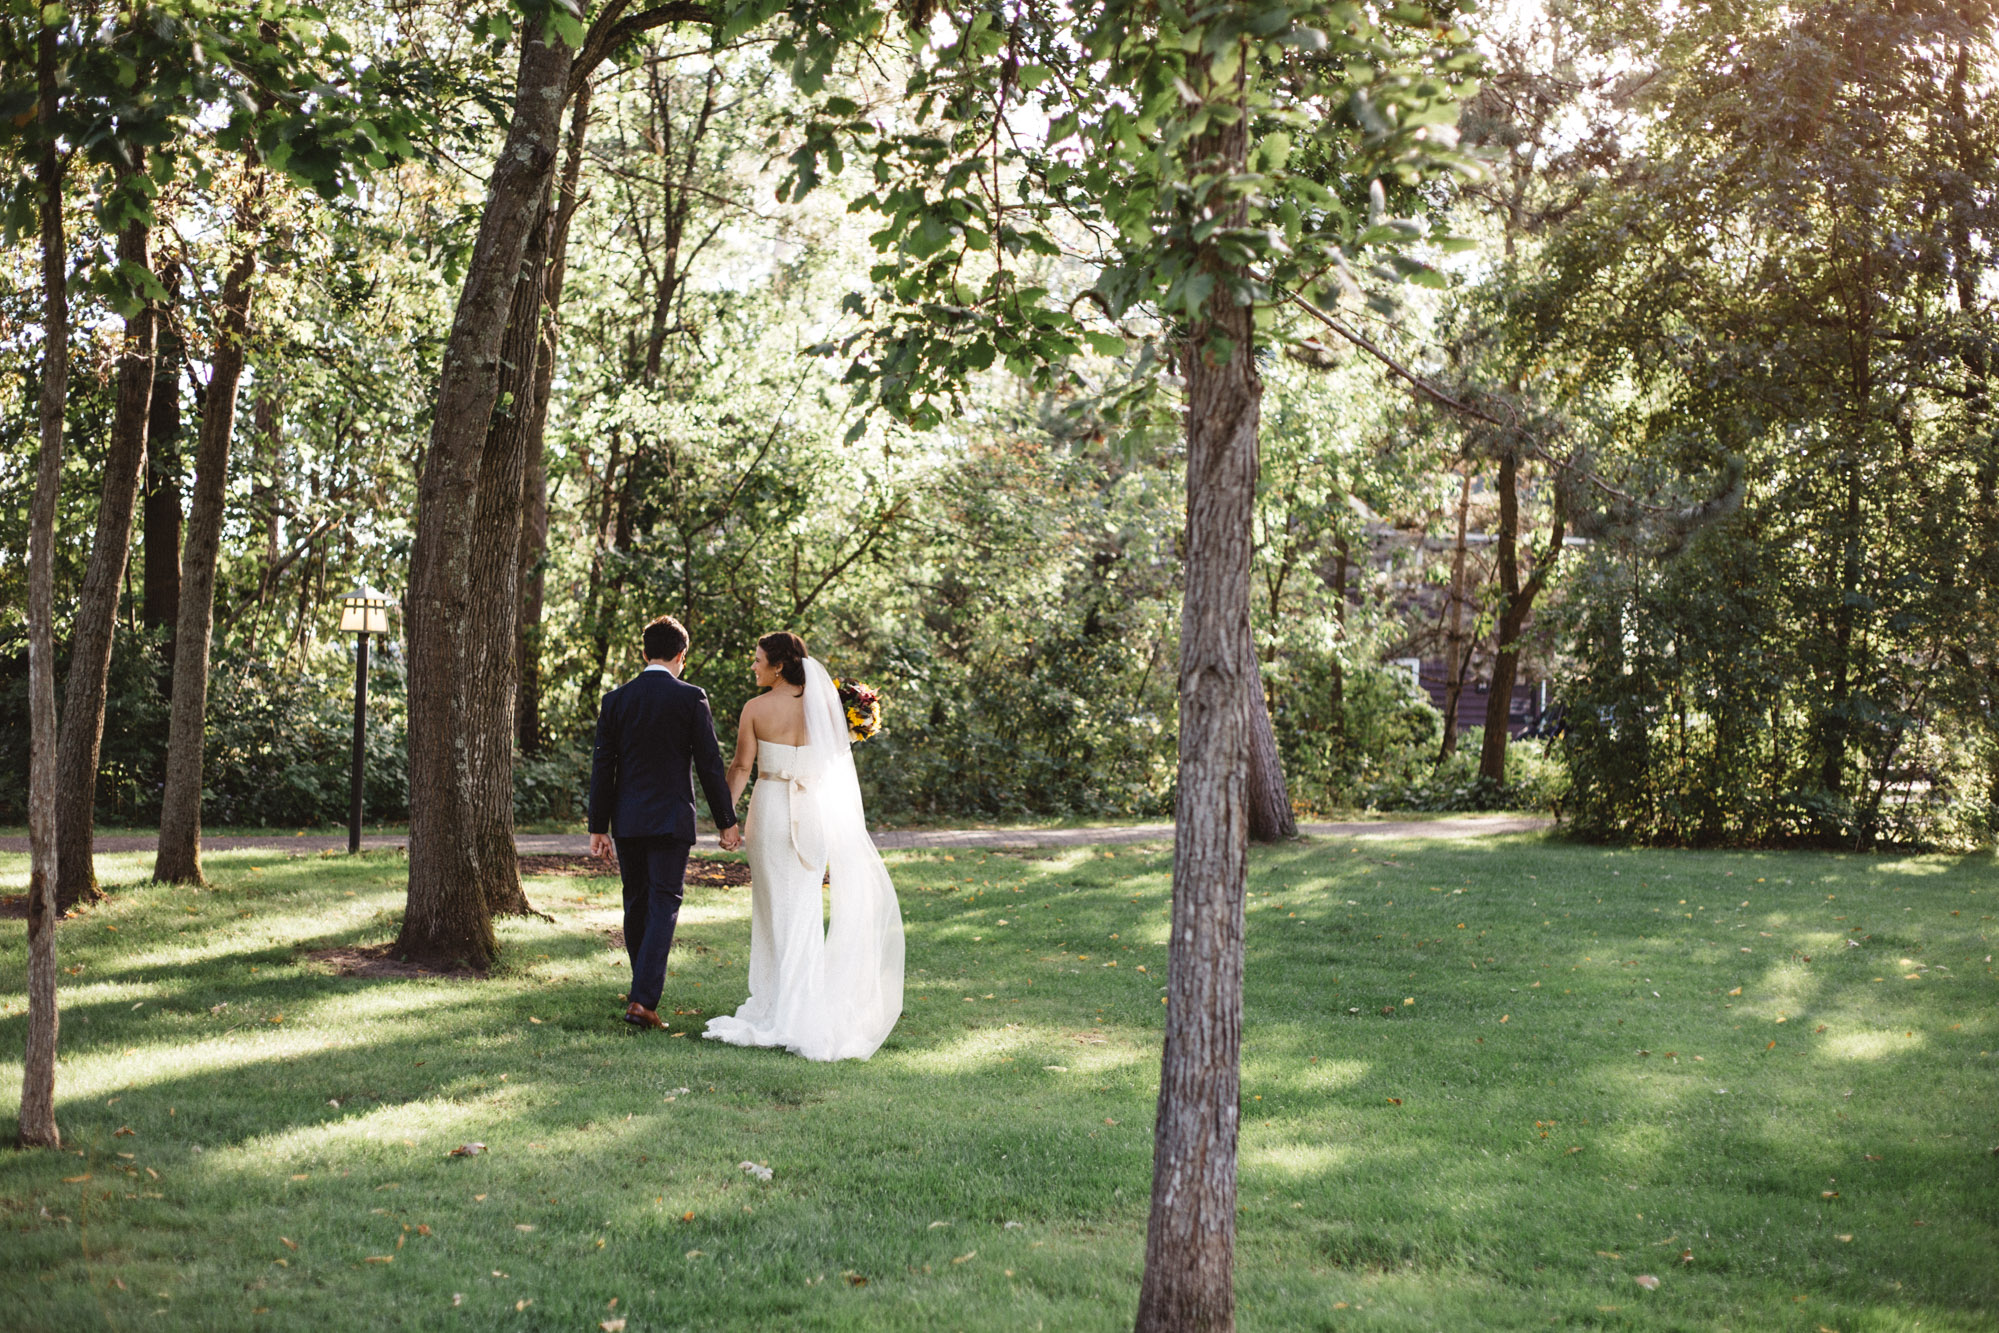 Modern wedding portraits at Grand View Lodge, photography by Britt DeZeeuw Brainerd MN photographer